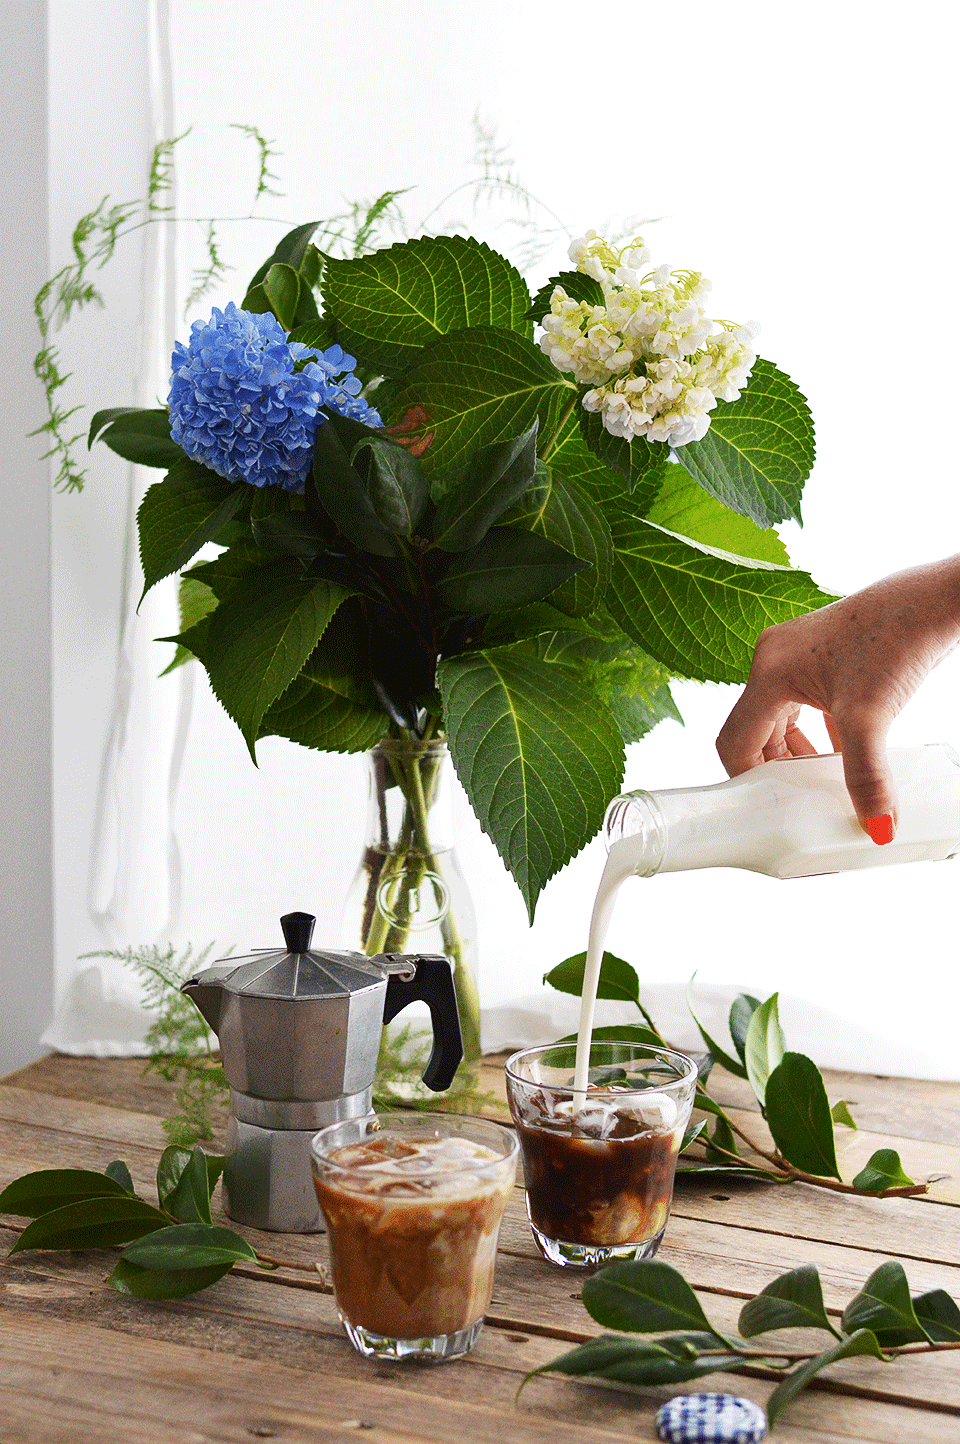 Coconut Iced Coffee | https://oandrajos.blogspot.com